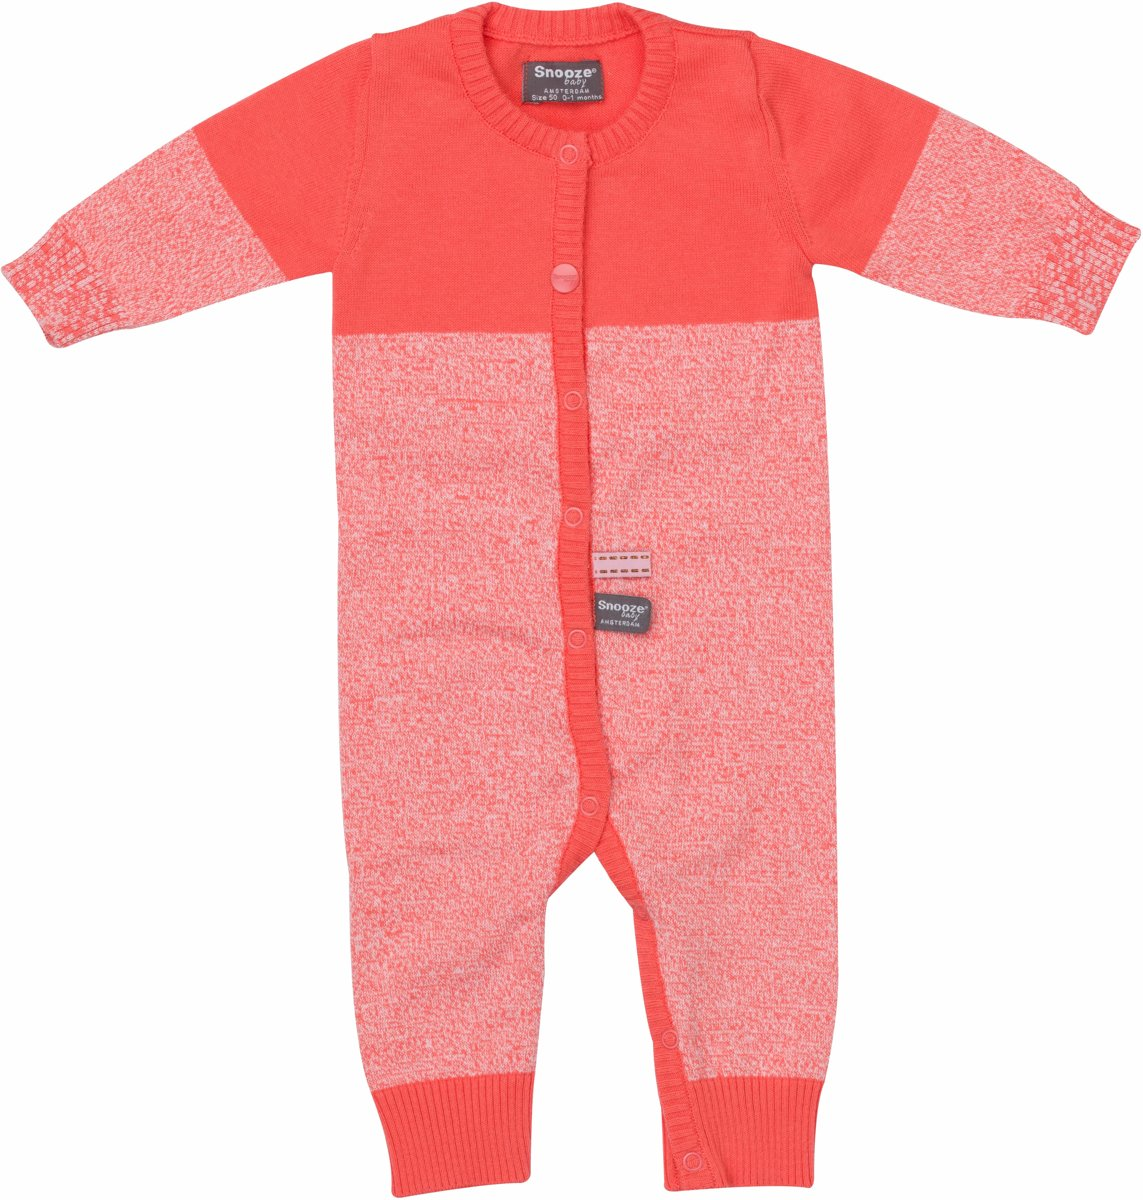 Maat 62 Babykleding.Snoozebaby Unisex Boxpakje Suit Knitted Coral Sunset Maat 62